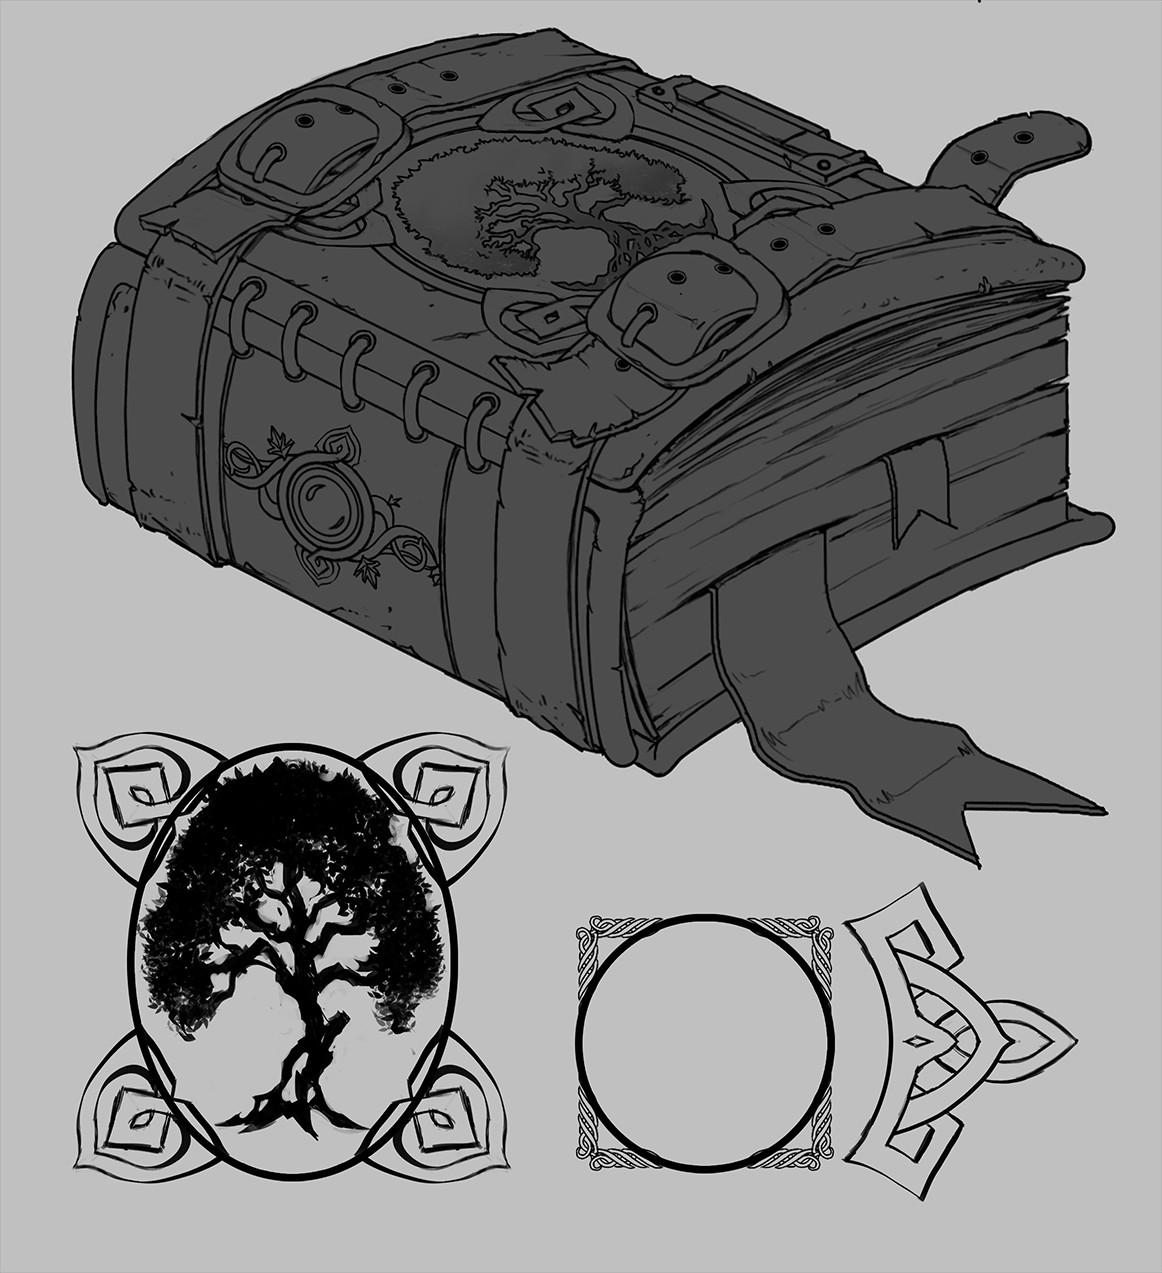 Yaron granot spellbook lineart